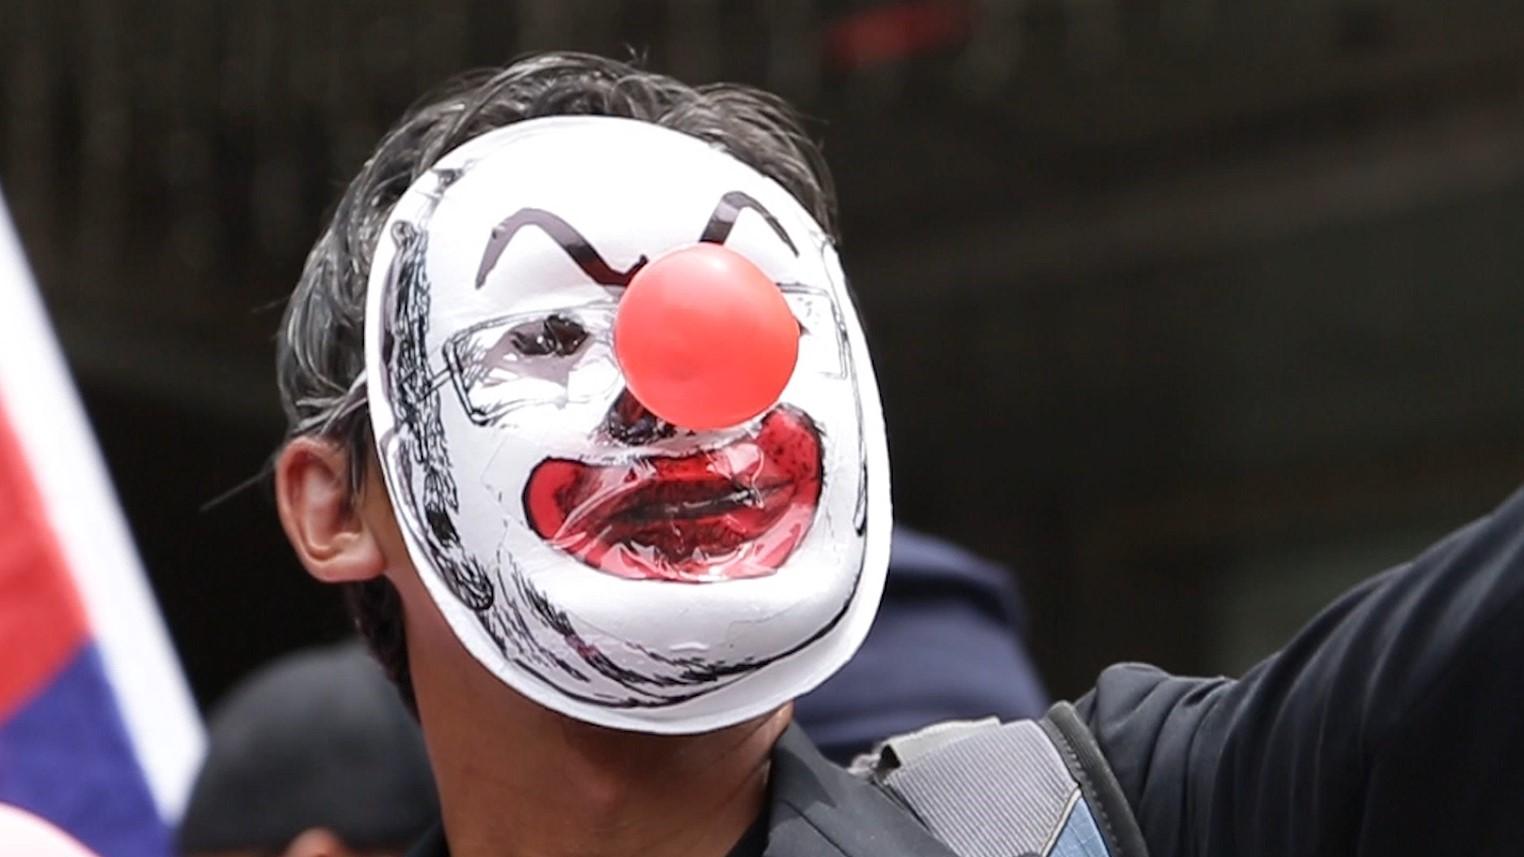 Kelptocrats_DogWoof_02.39_Clown Faced Protester_903977.jpg